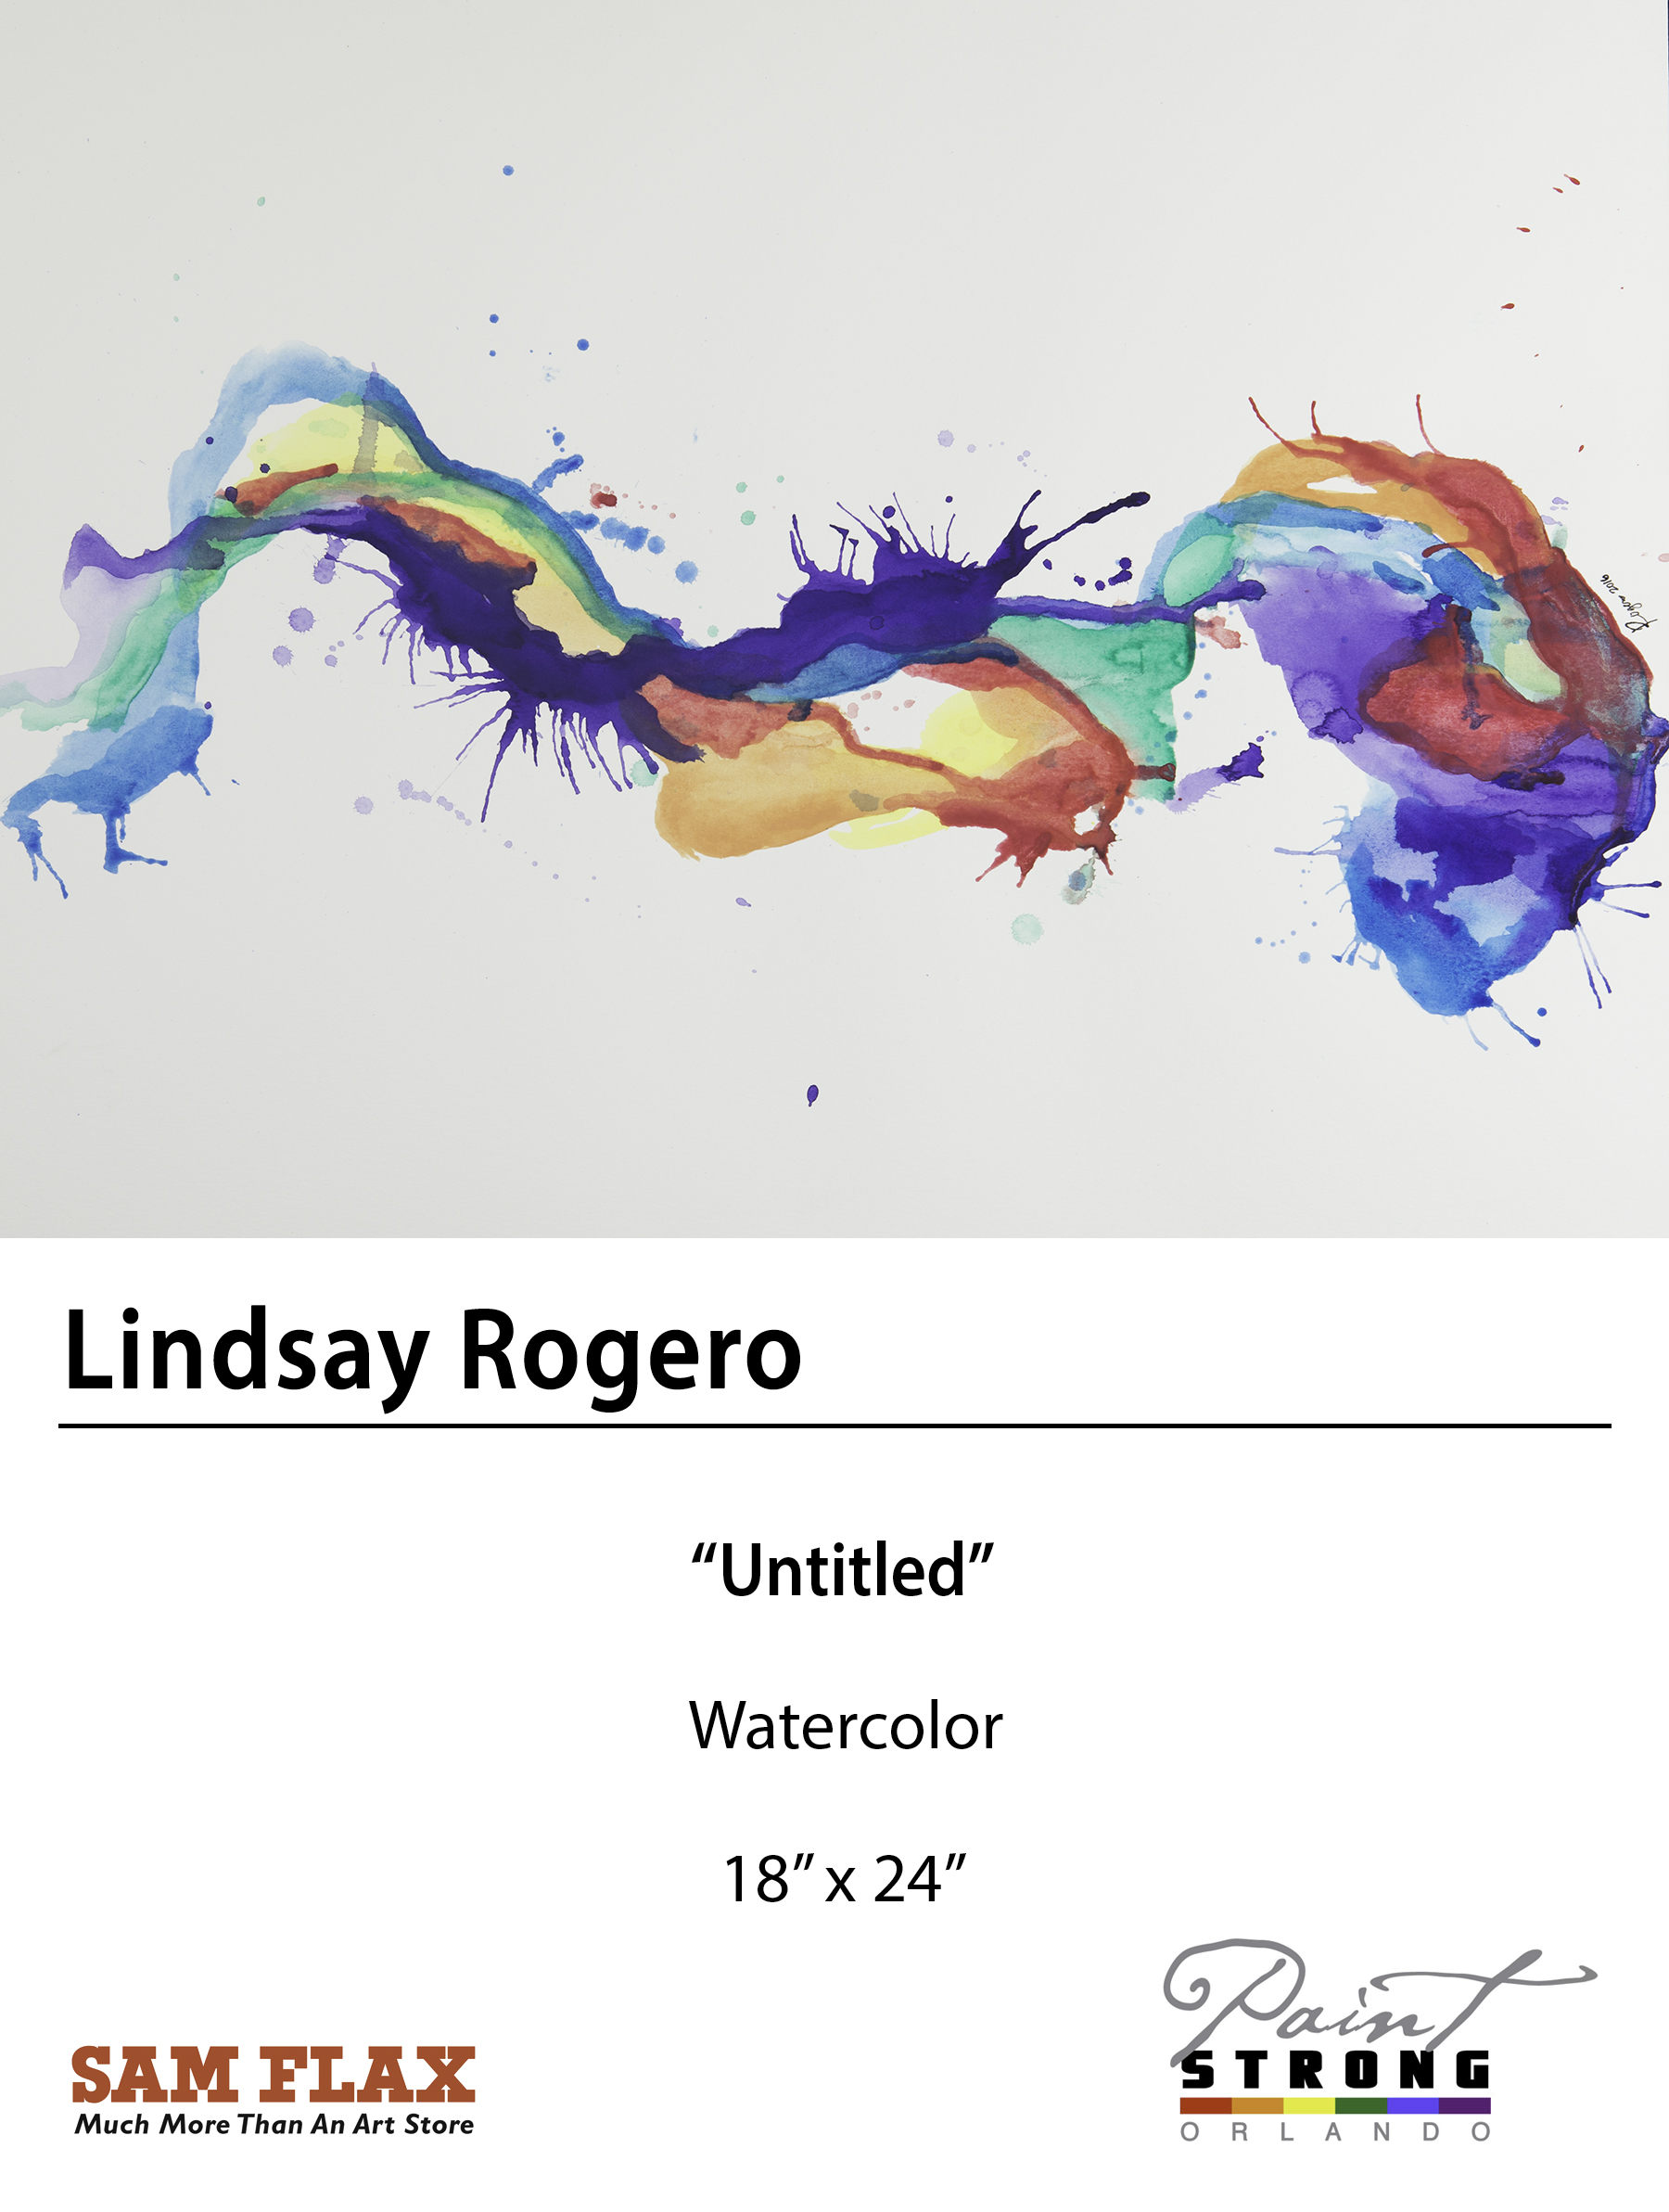 Lindsay Rogero